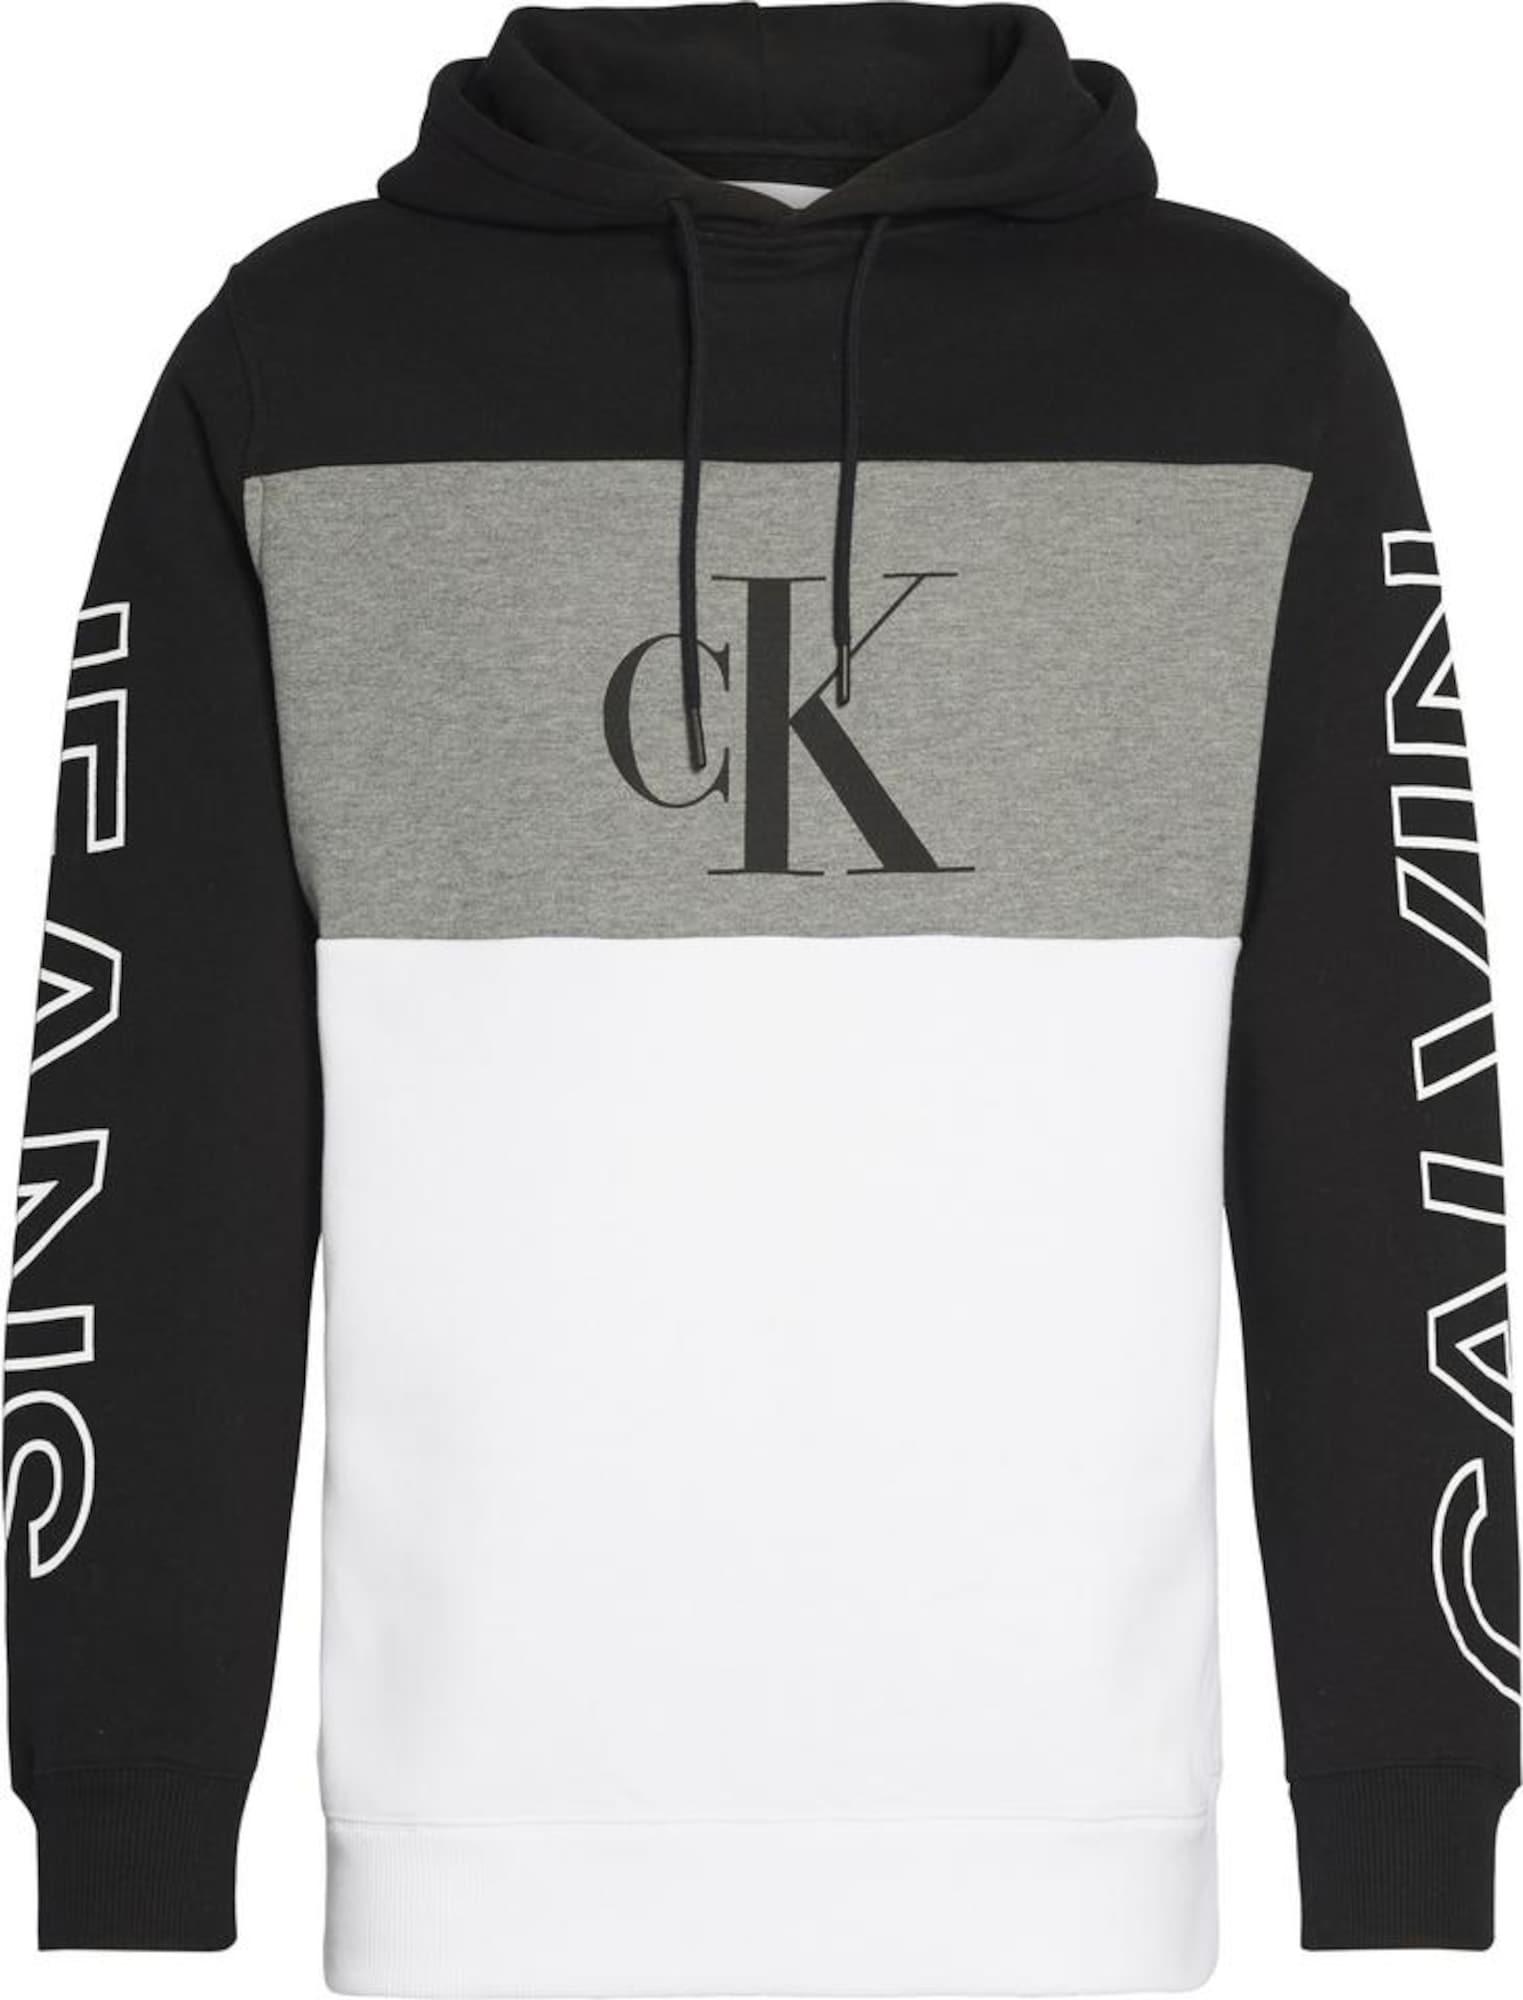 Calvin Klein Jeans Megztinis be užsegimo juoda / balta / margai pilka